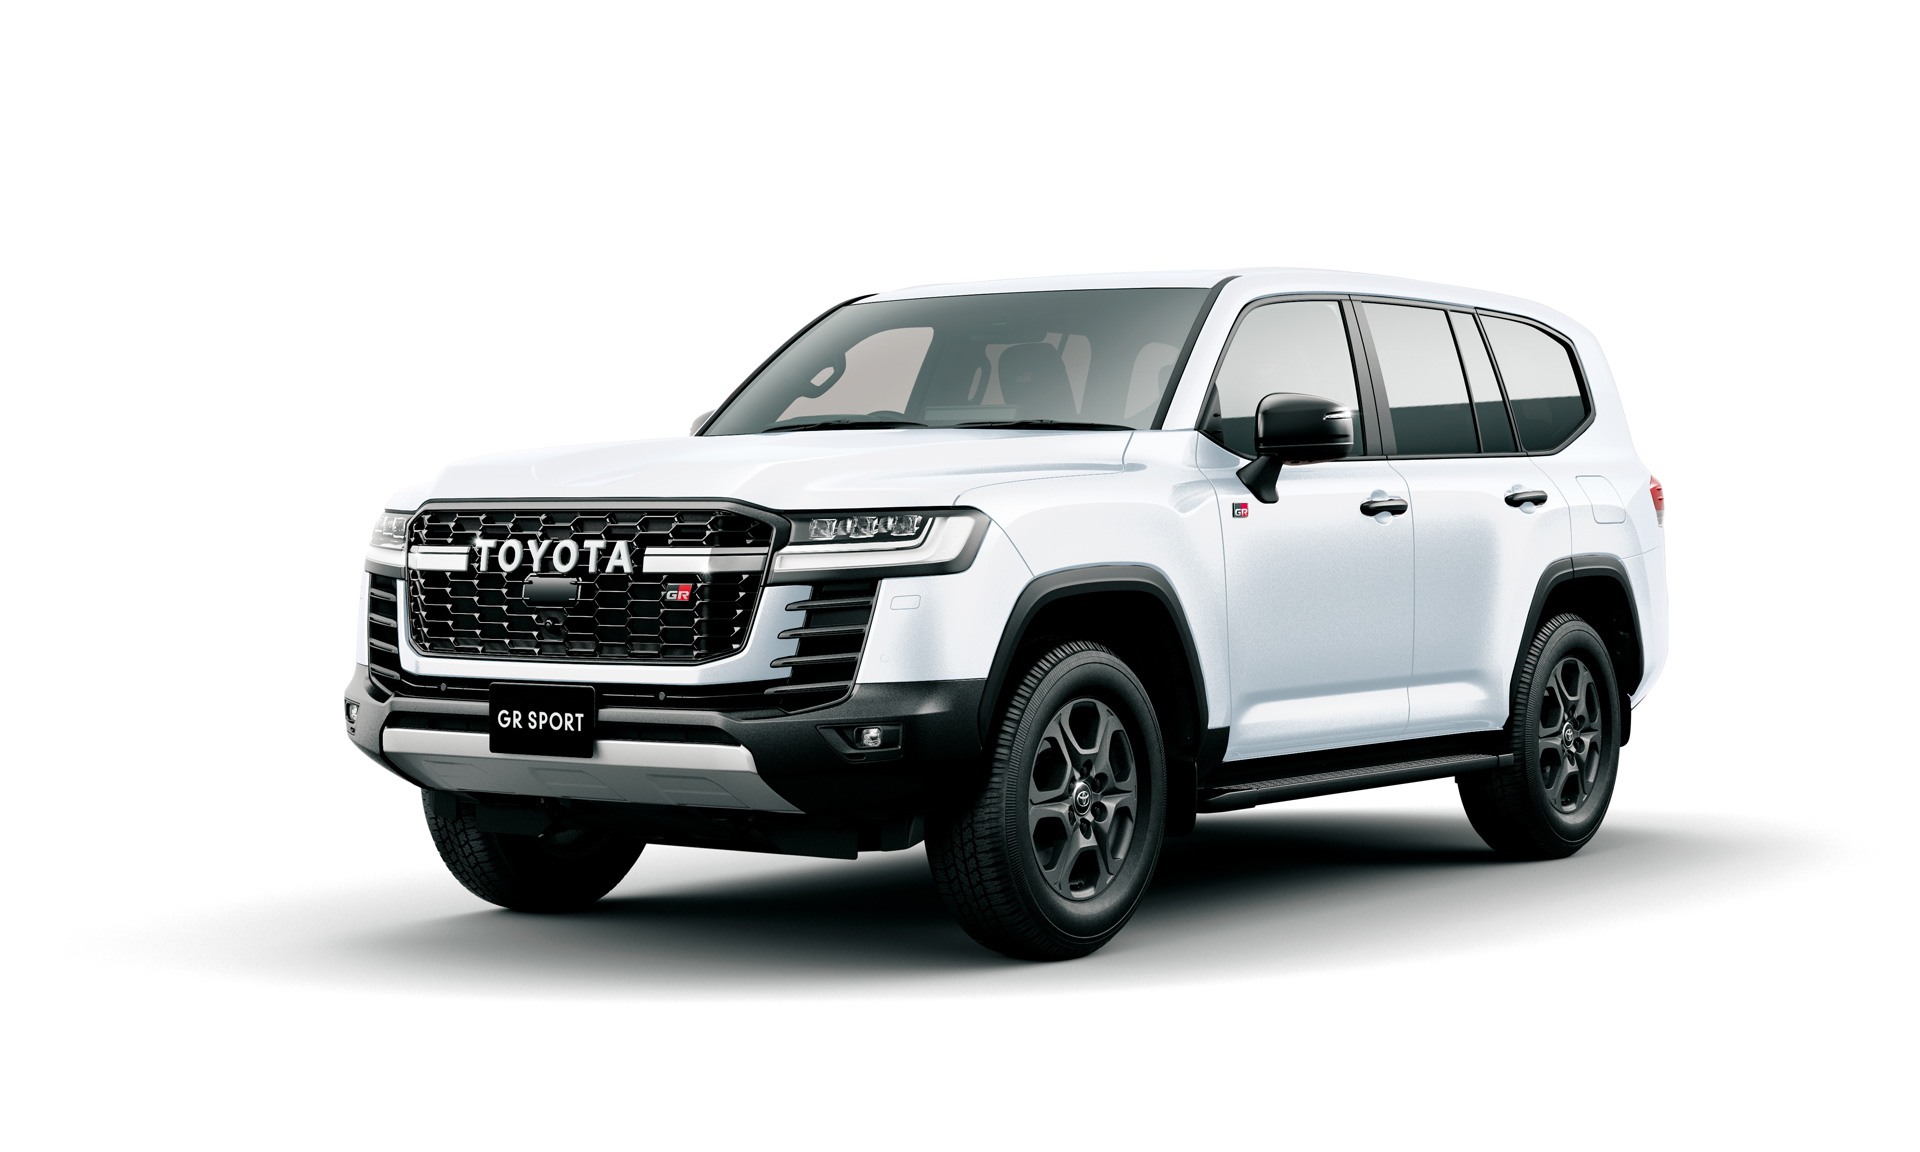 Toyota Launches New Land Cruiser - Image 7